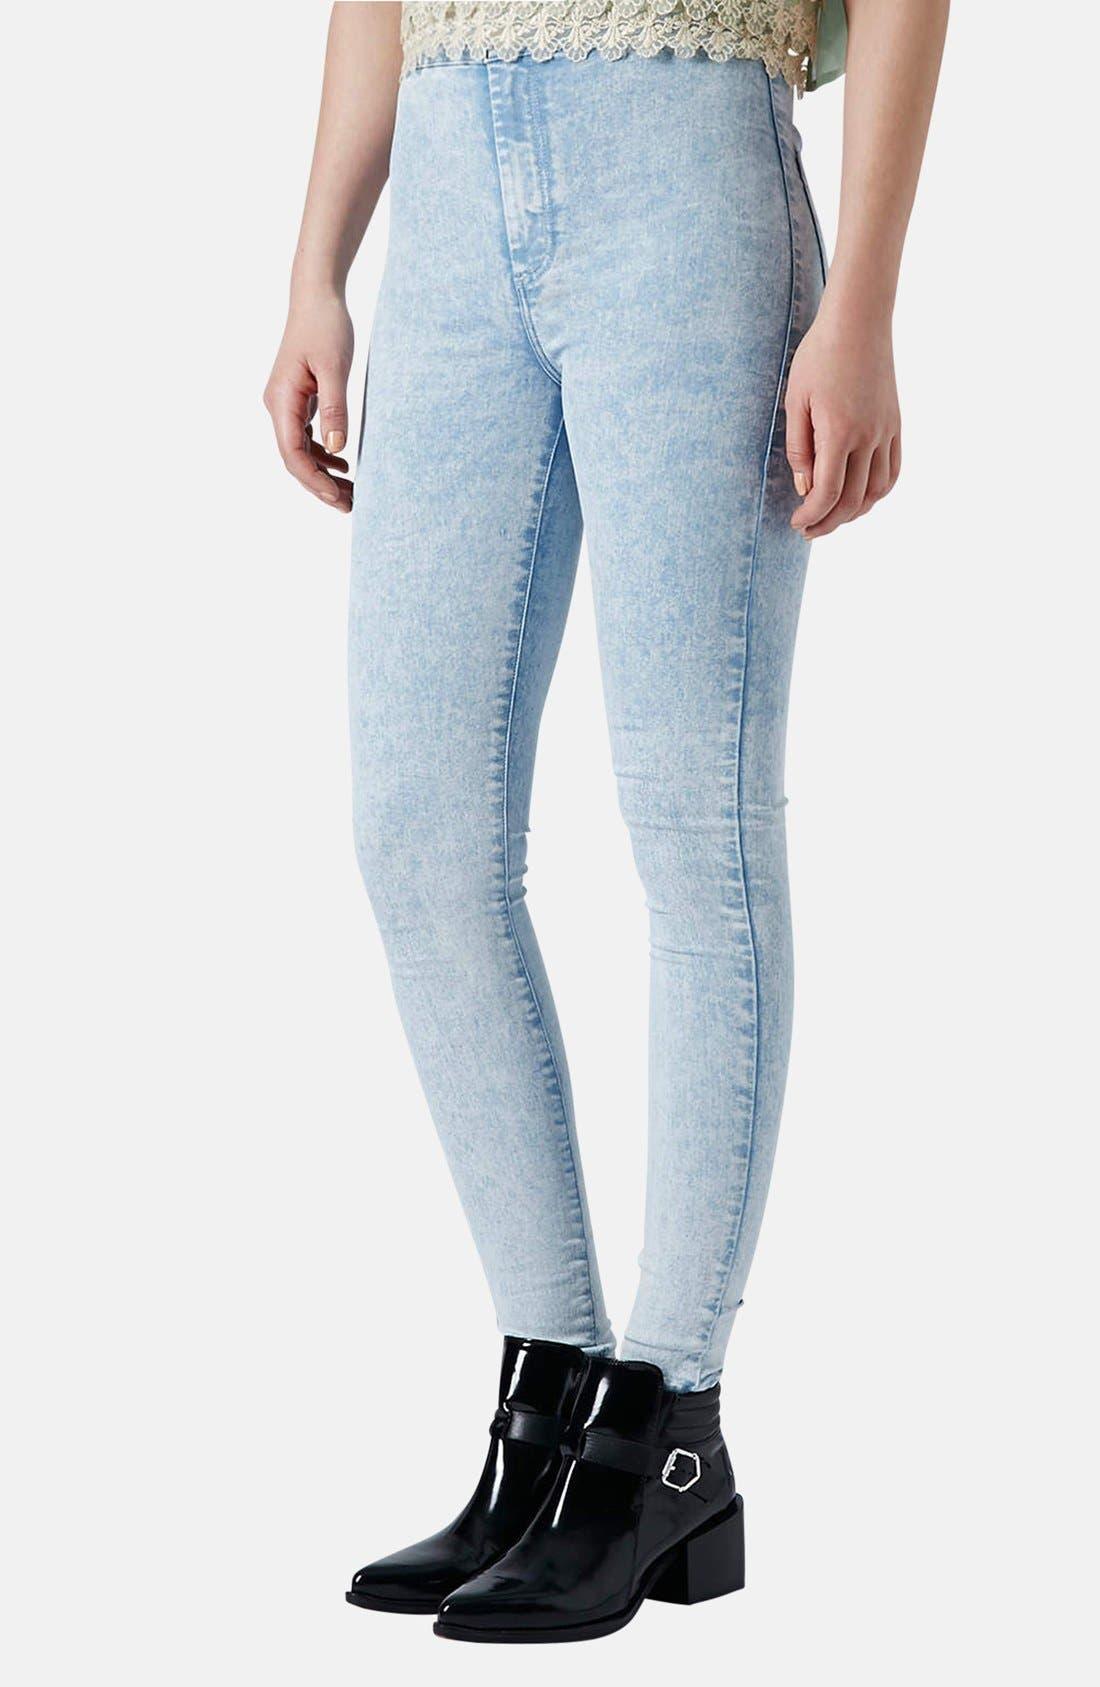 Main Image - Topshop Moto 'Joni' Acid Wash High Rise Skinny Jeans (Light) (Regular & Short)